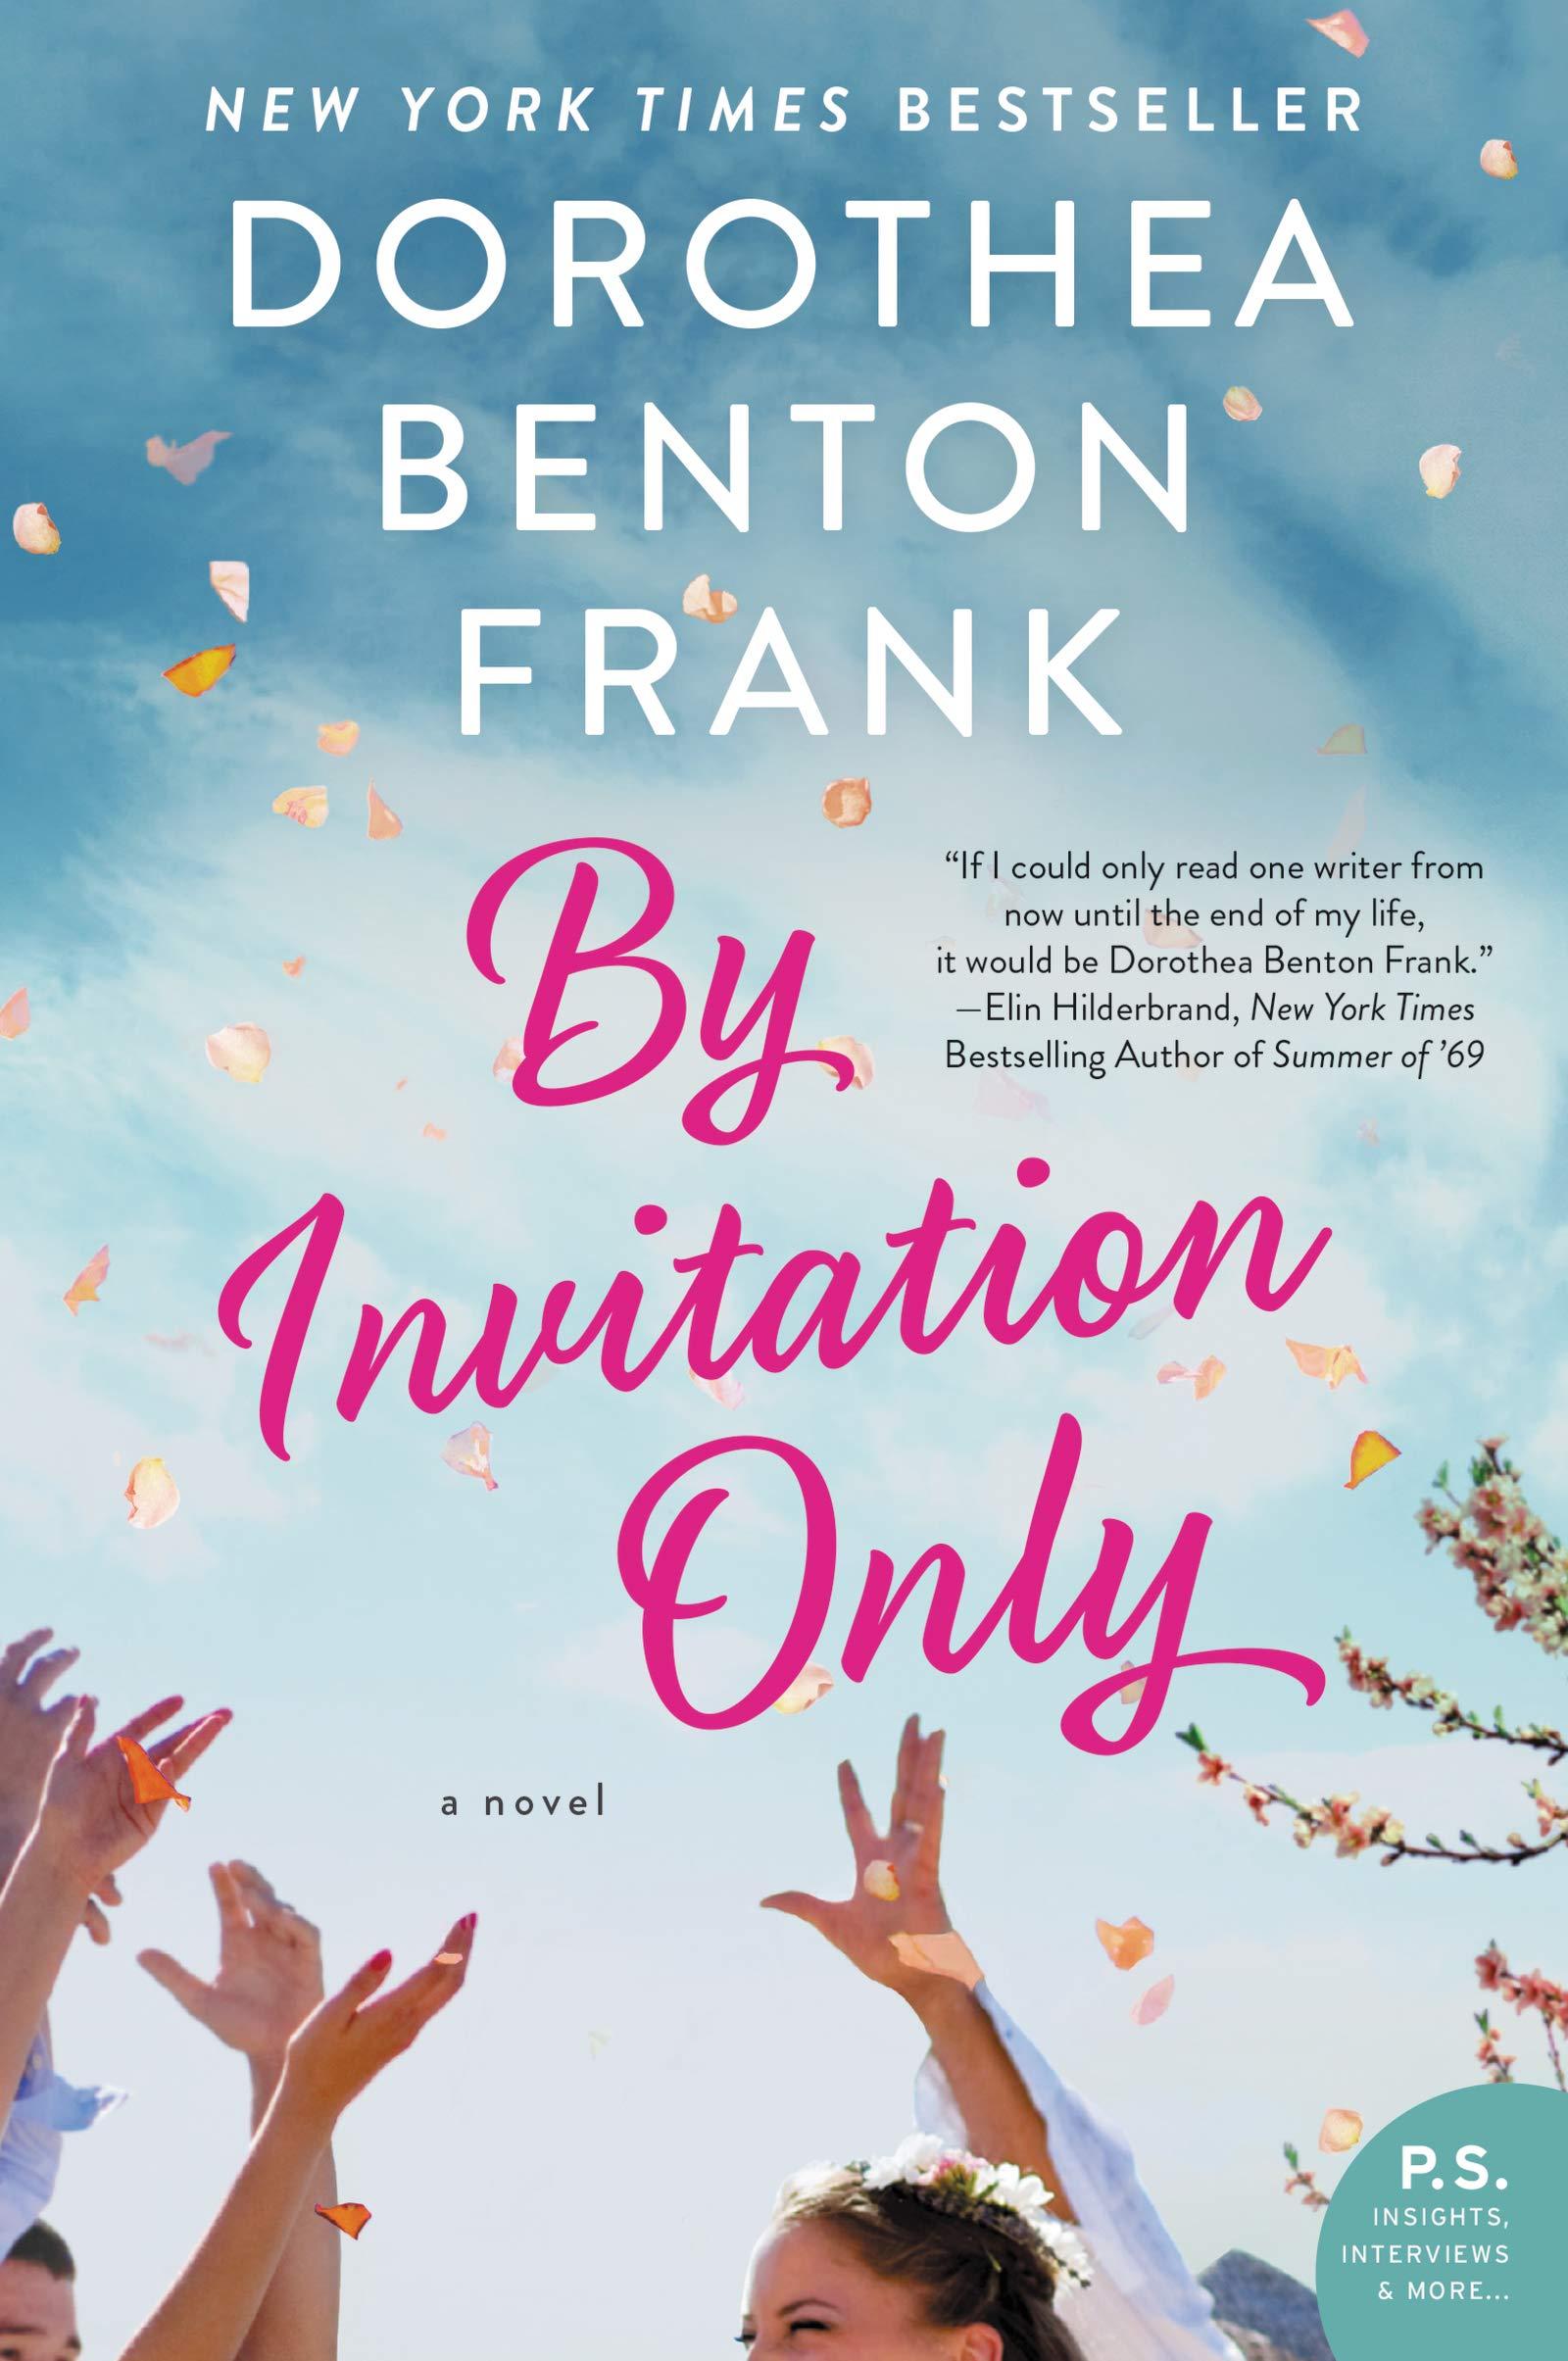 By Invitation Only: A Novel